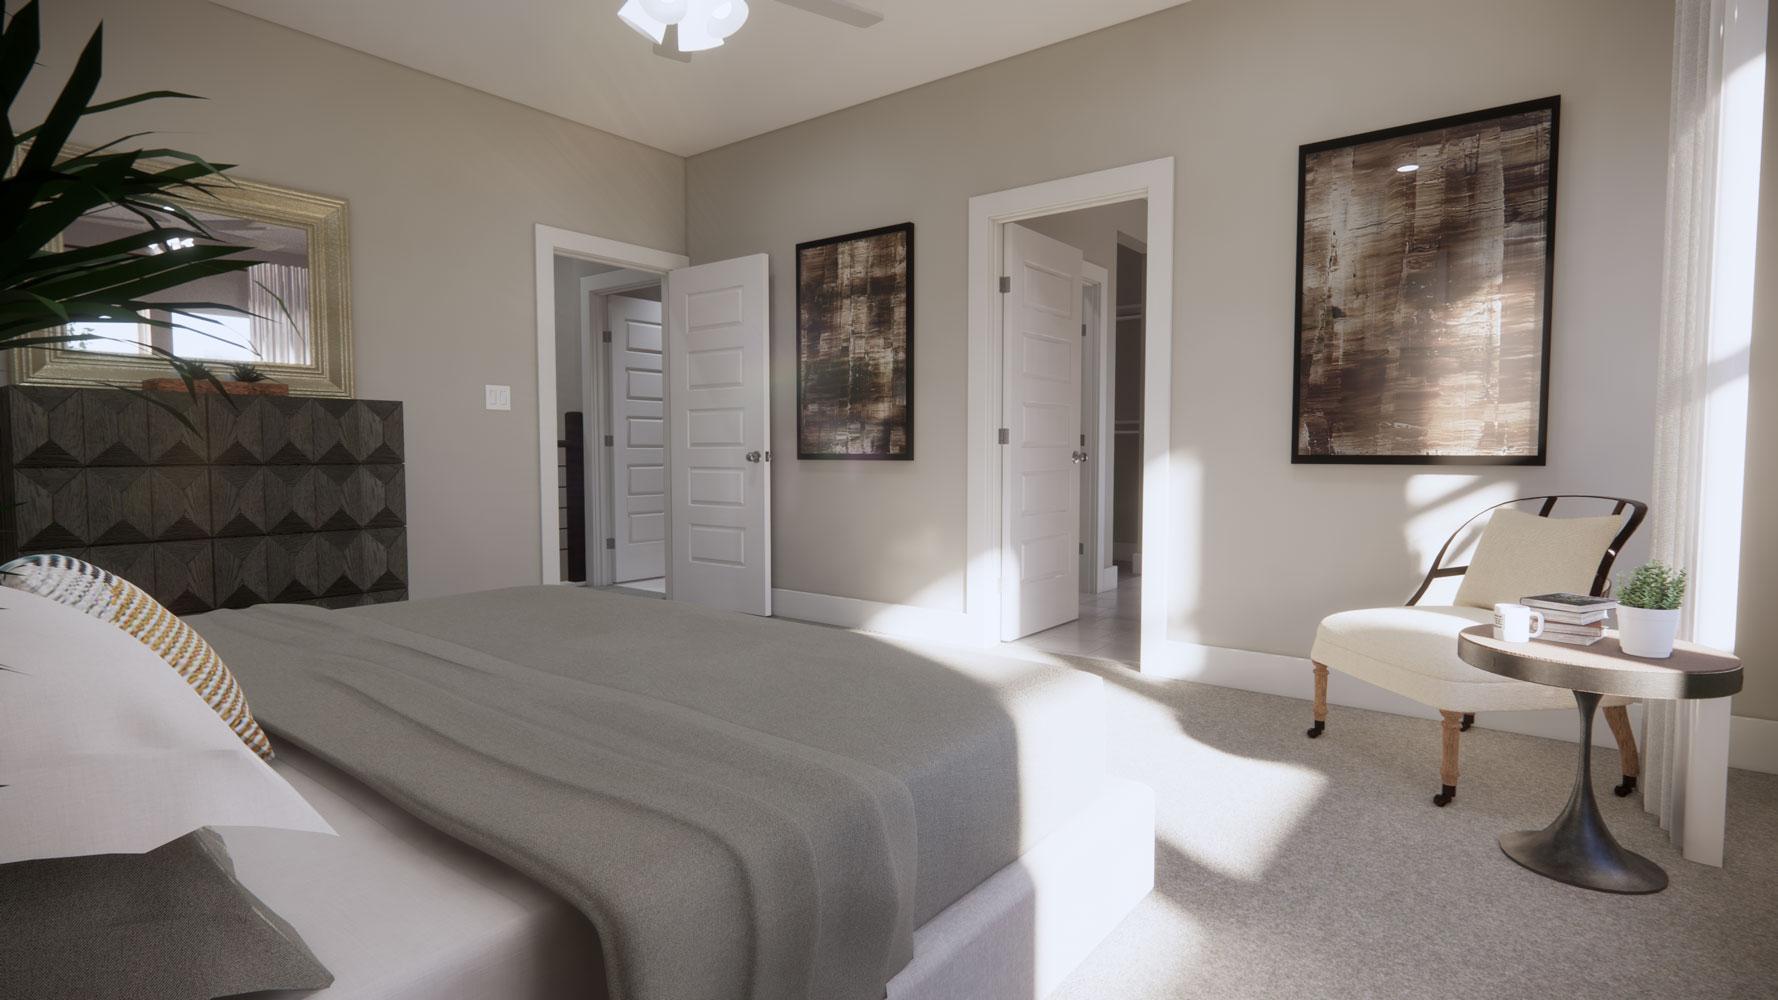 Stylish Bedrooms at Echelon at Reverchon Bluffs in Dallas, Texas